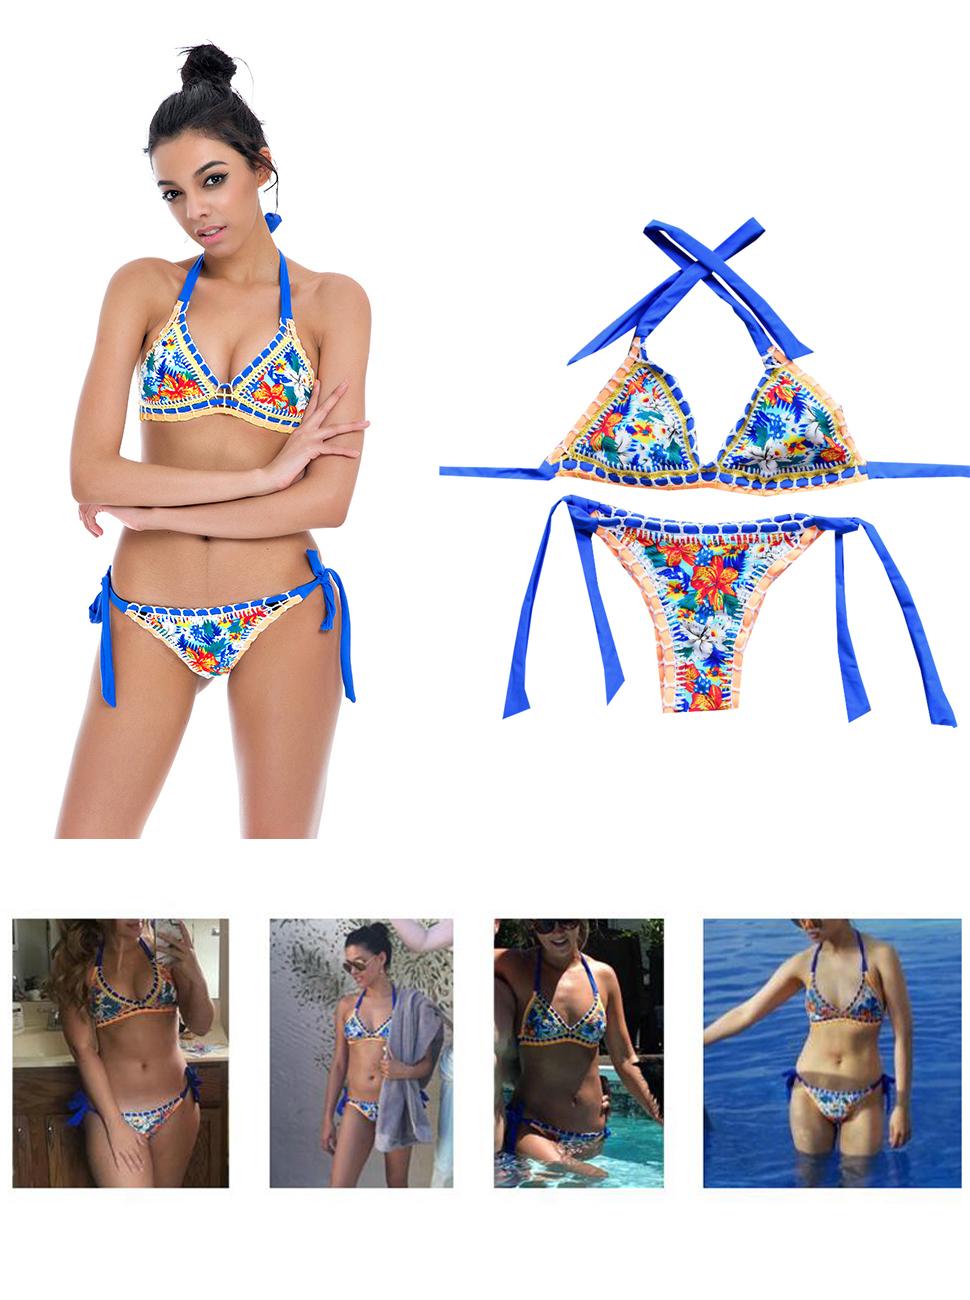 b43b86722ef Amazon.com: Sherry007 Sexy Handmade Crochet Bikini Swimsuit Triangle ...